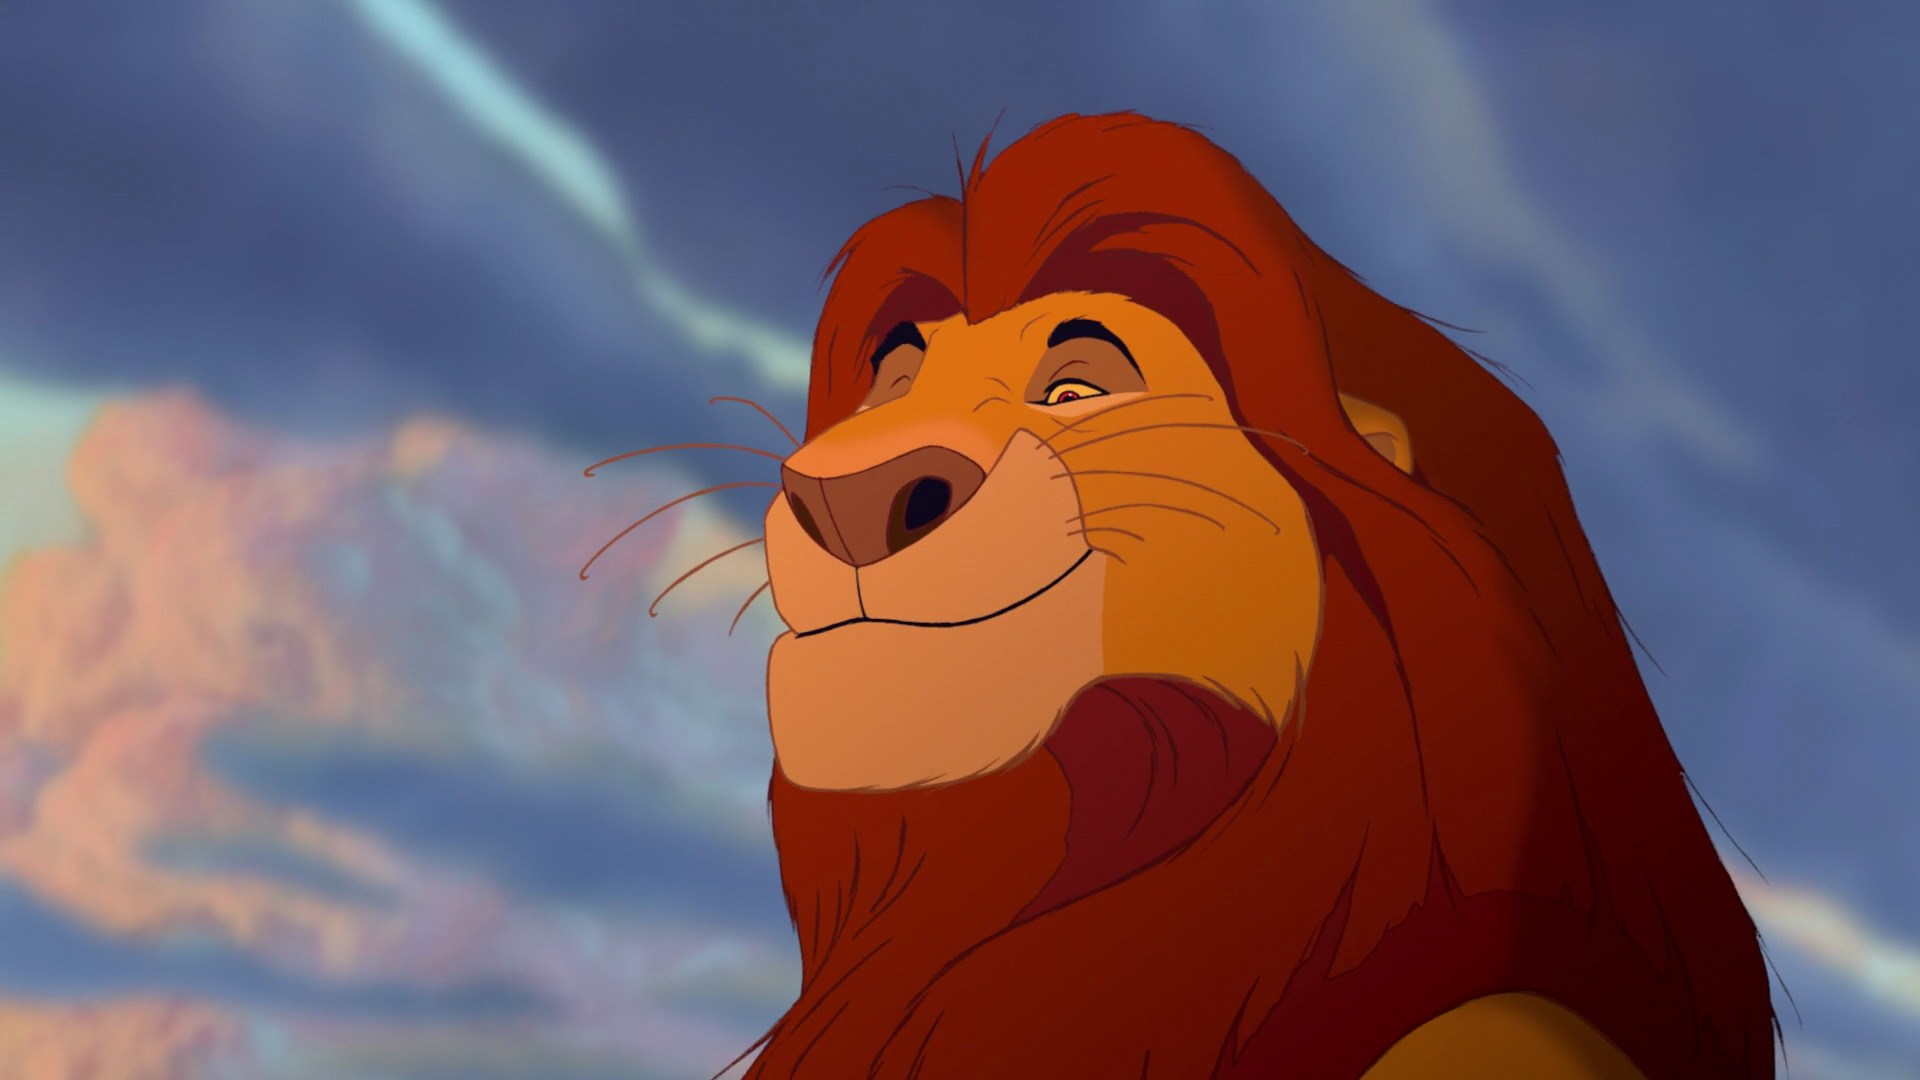 Lion-king-disneyscreencaps.com-218.jpg